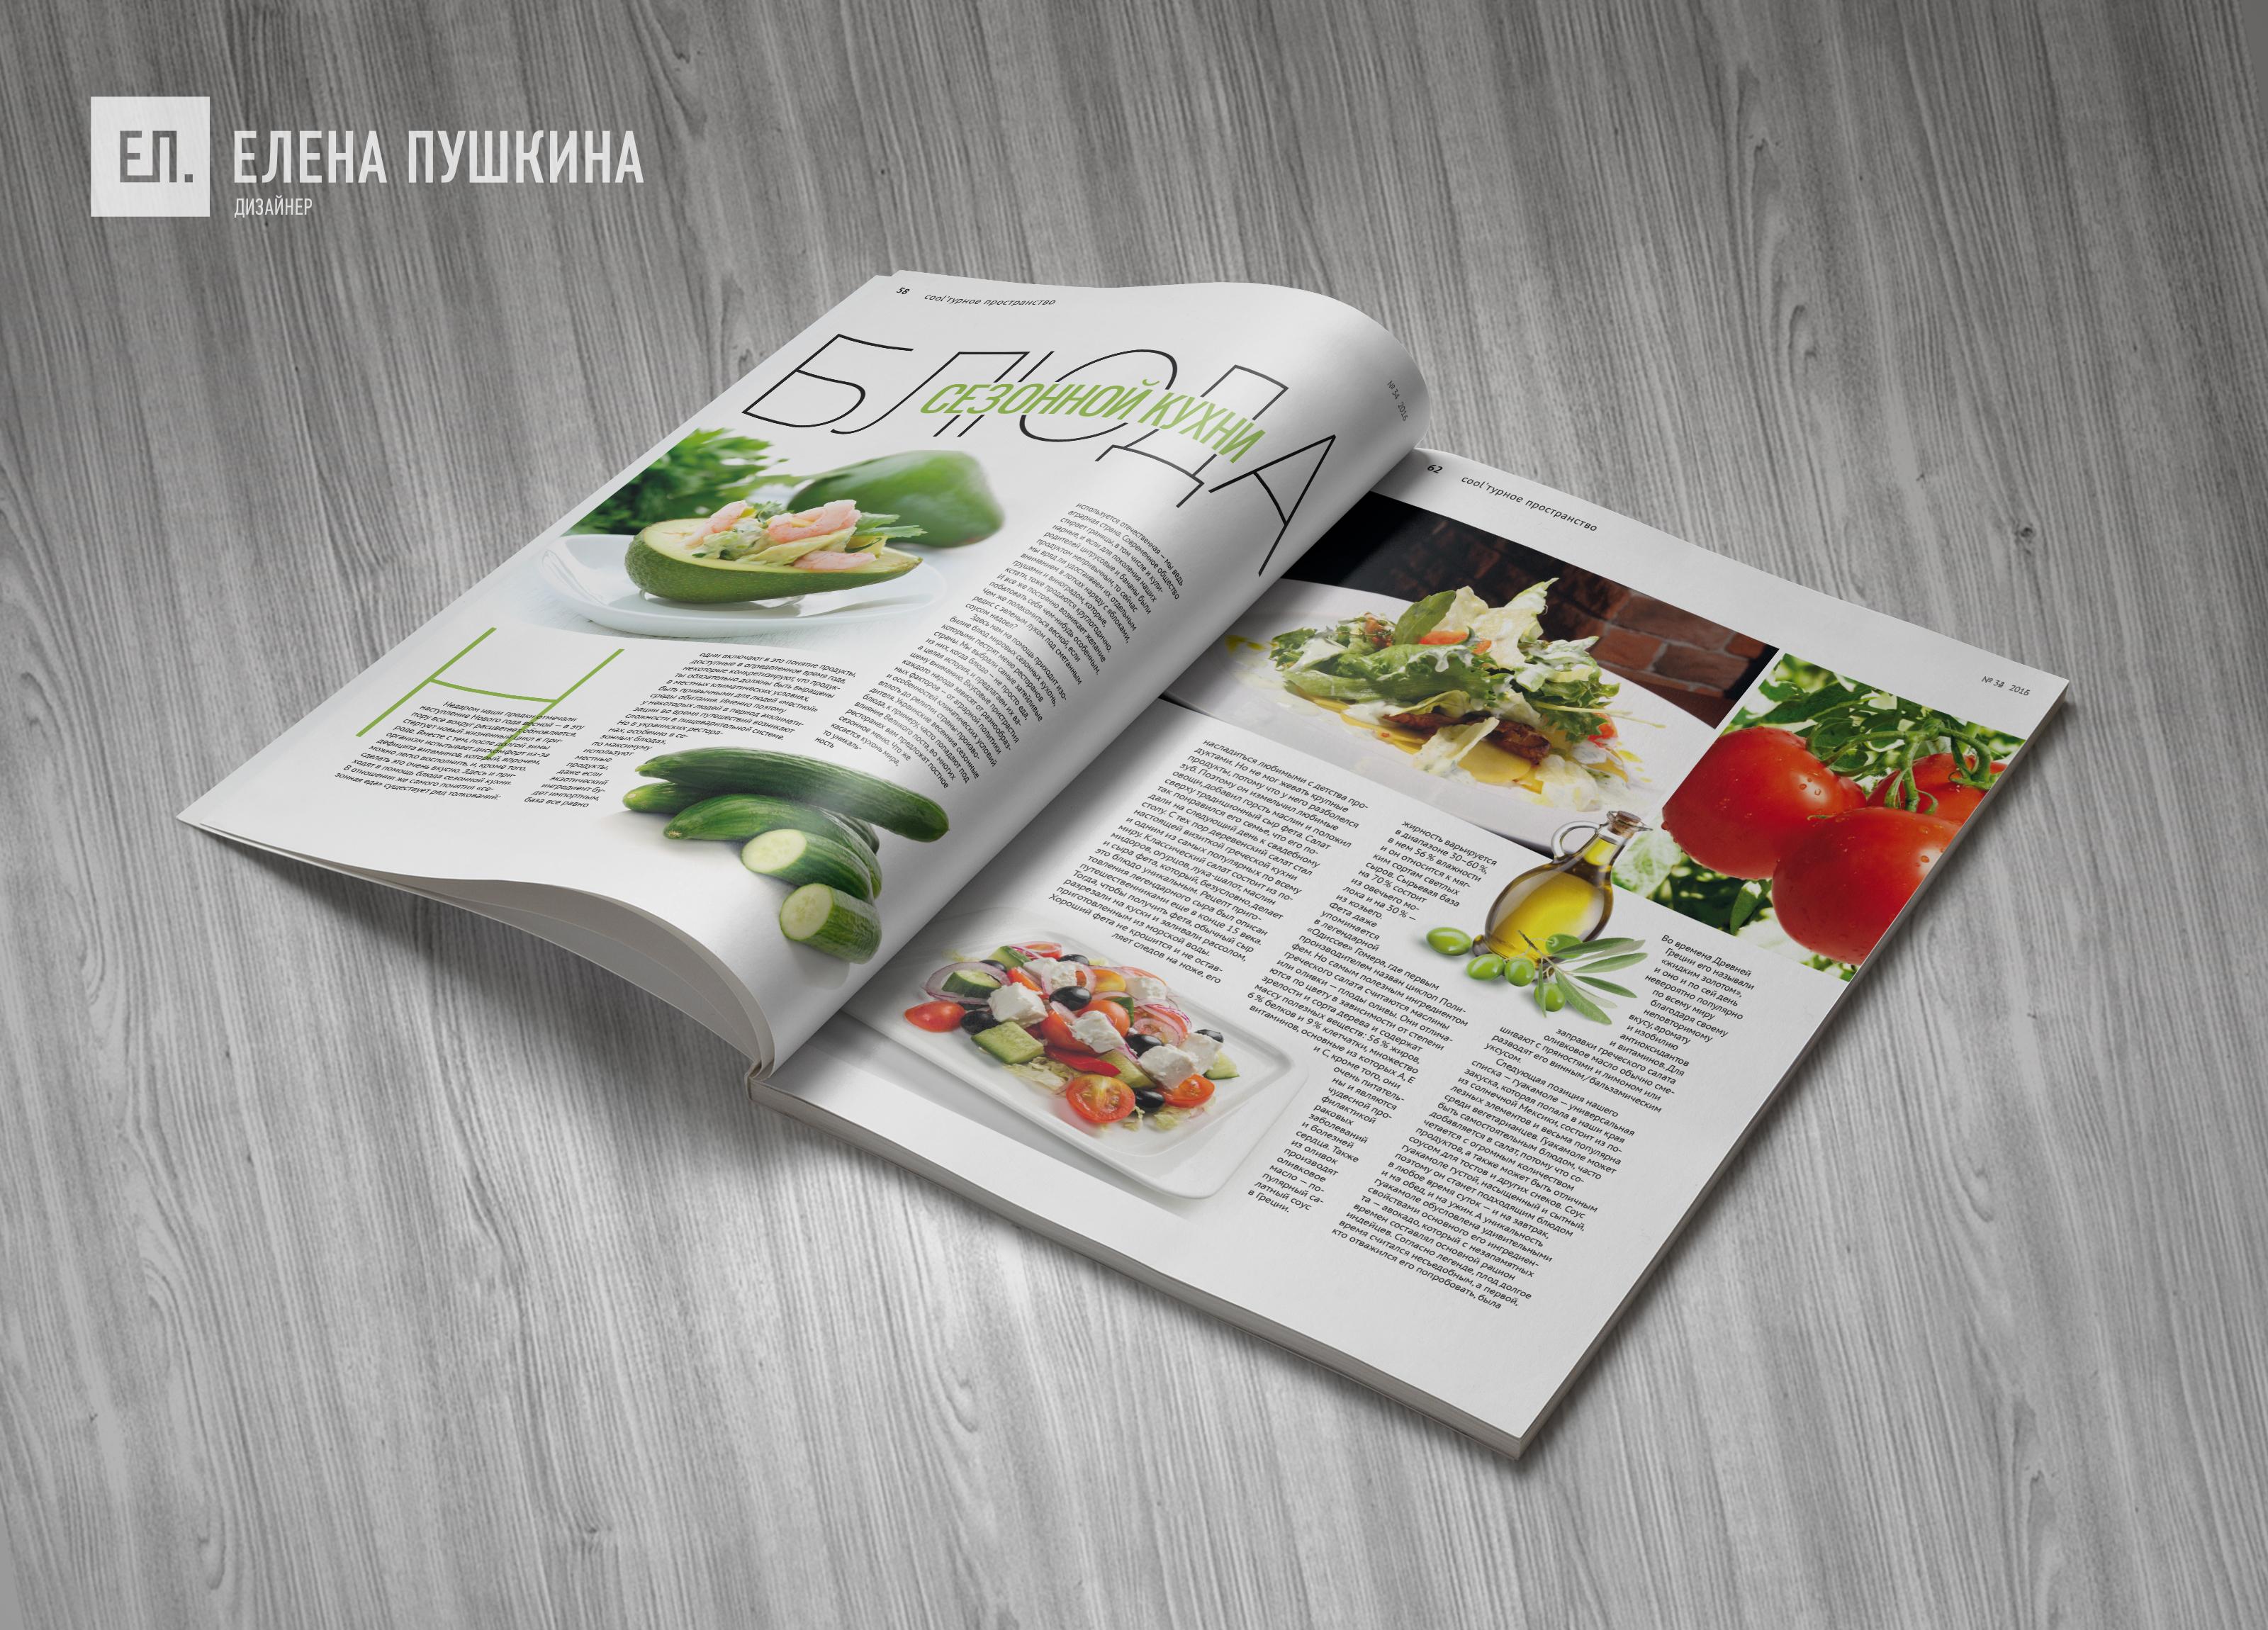 Глянцевый журнал «CoolBaba» №34 весна 2016— разработка дизайна ивёрстка журнала Разработка журналов Портфолио